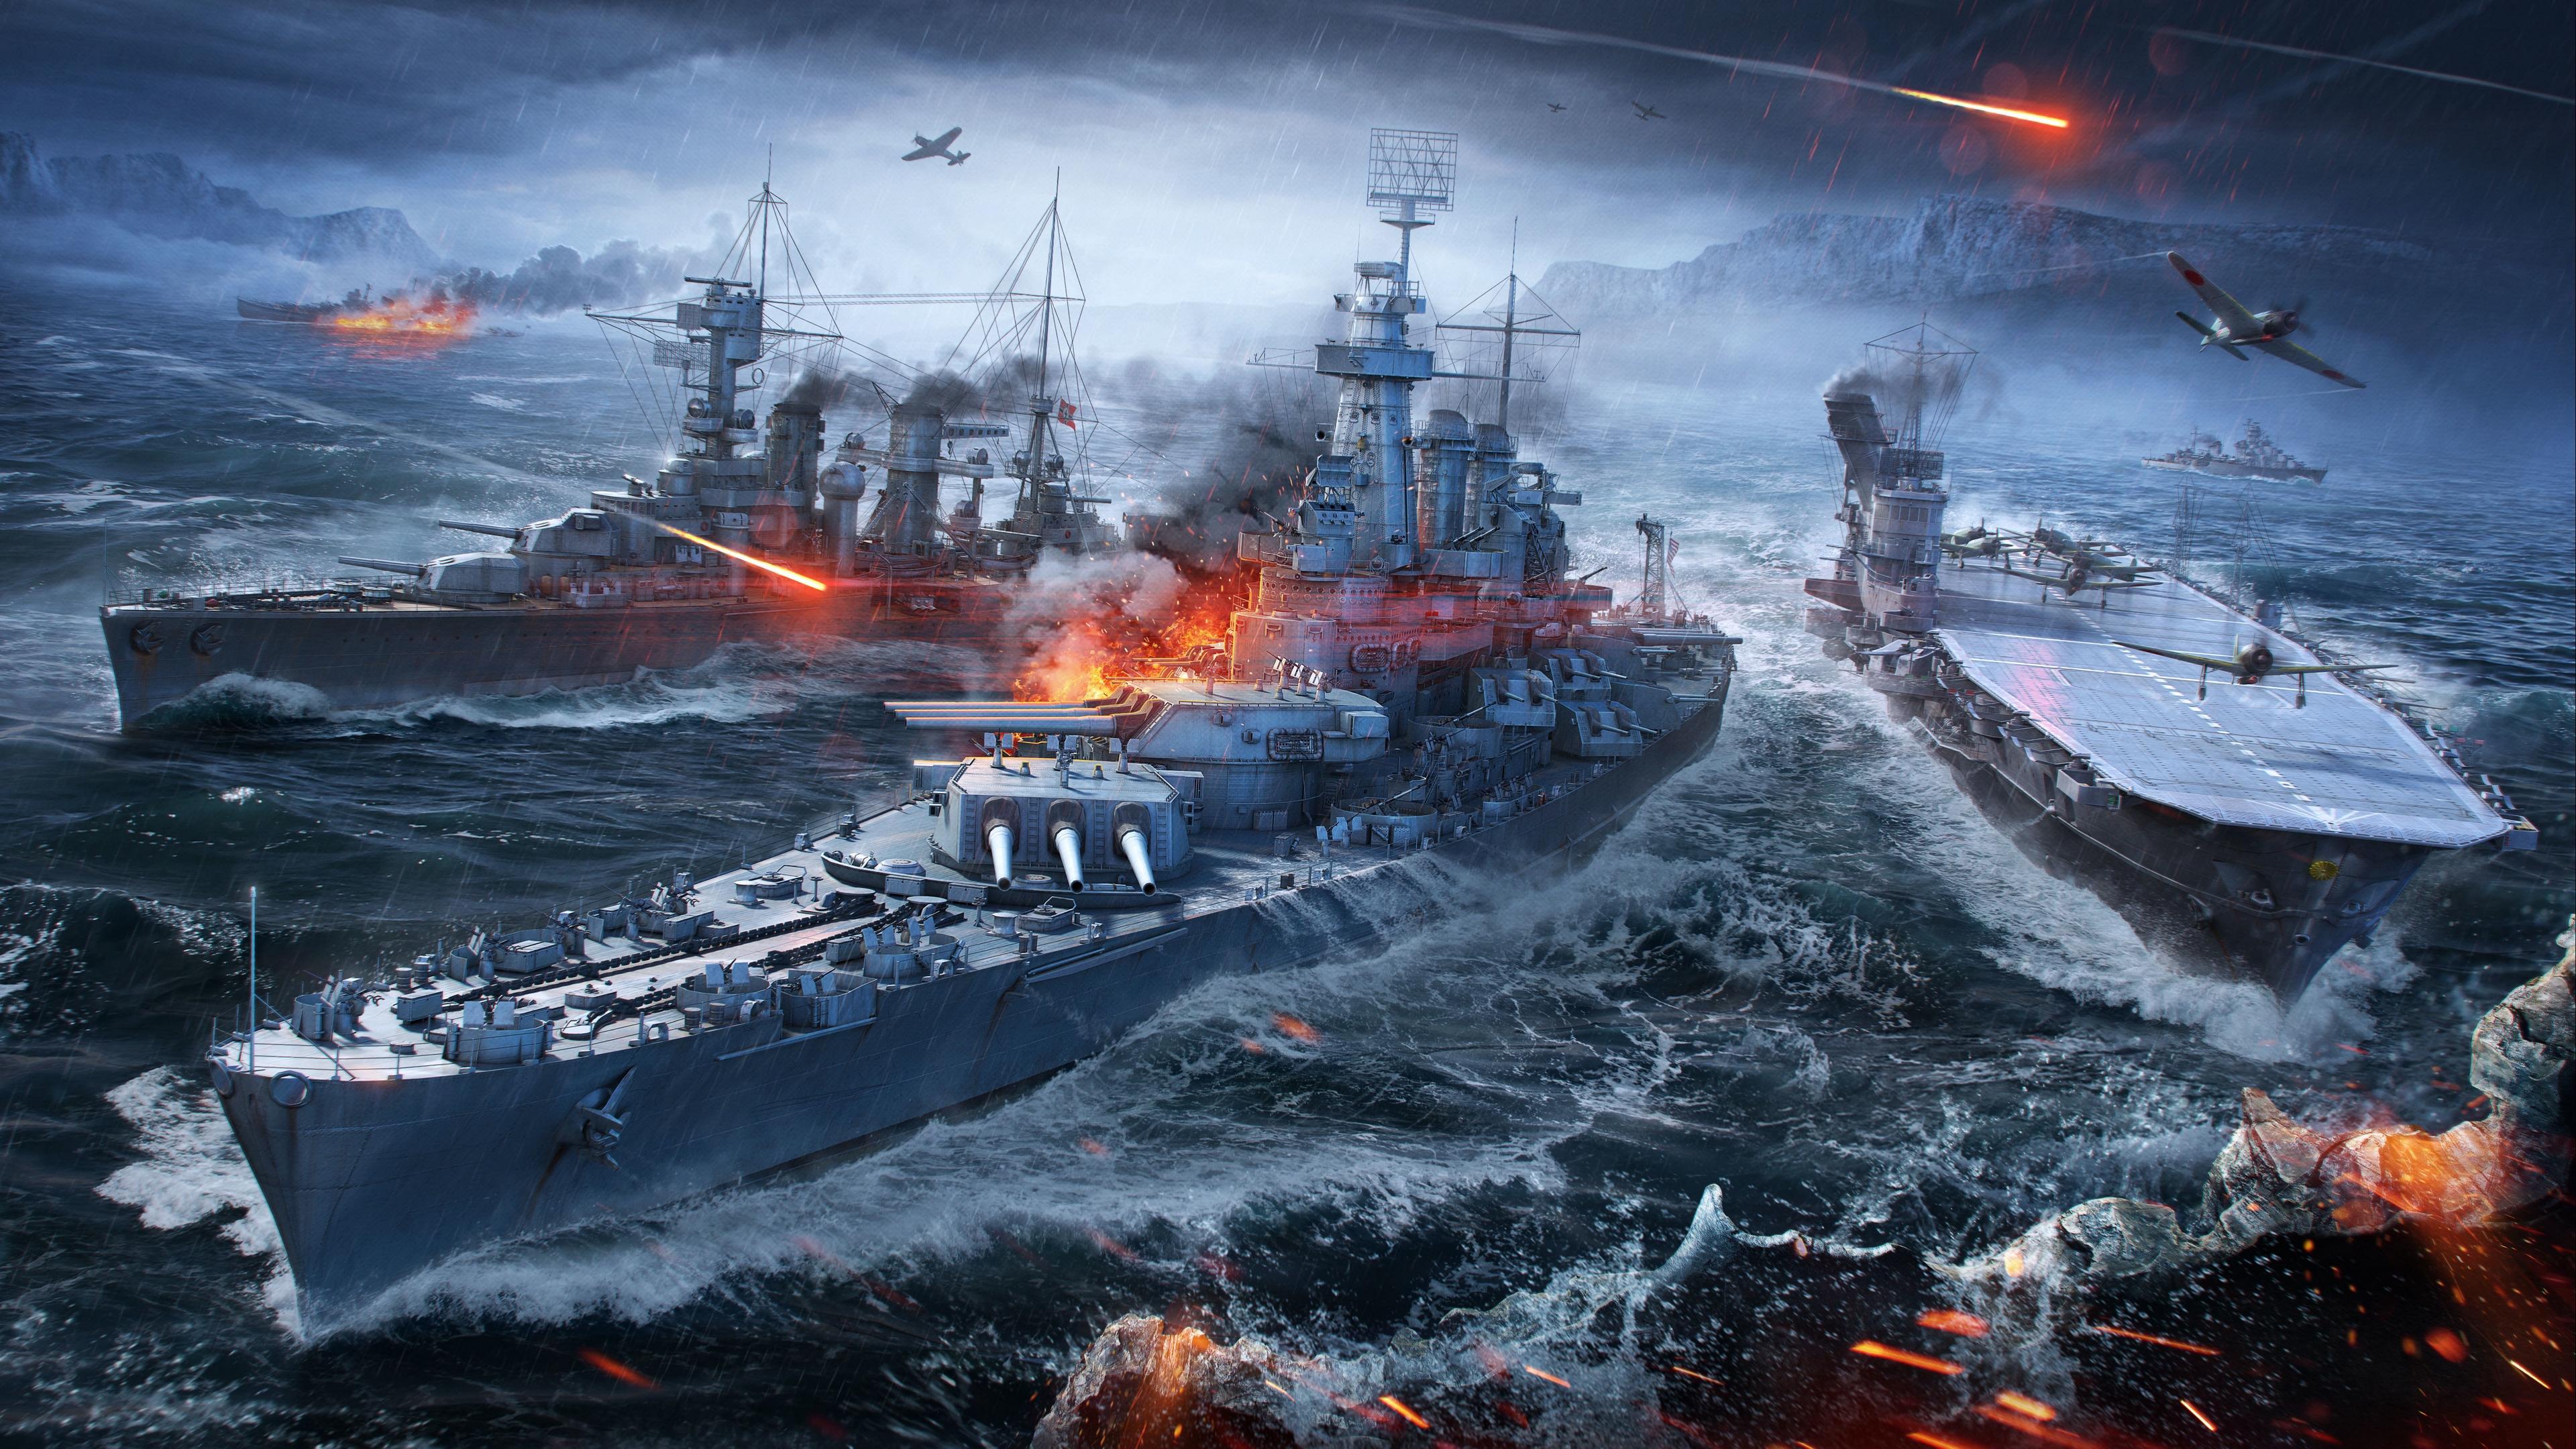 world of warships wargaming net ships sea 4k 1538944957 - world of warships, wargaming net, ships, sea 4k - world of warships, wargaming net, ships